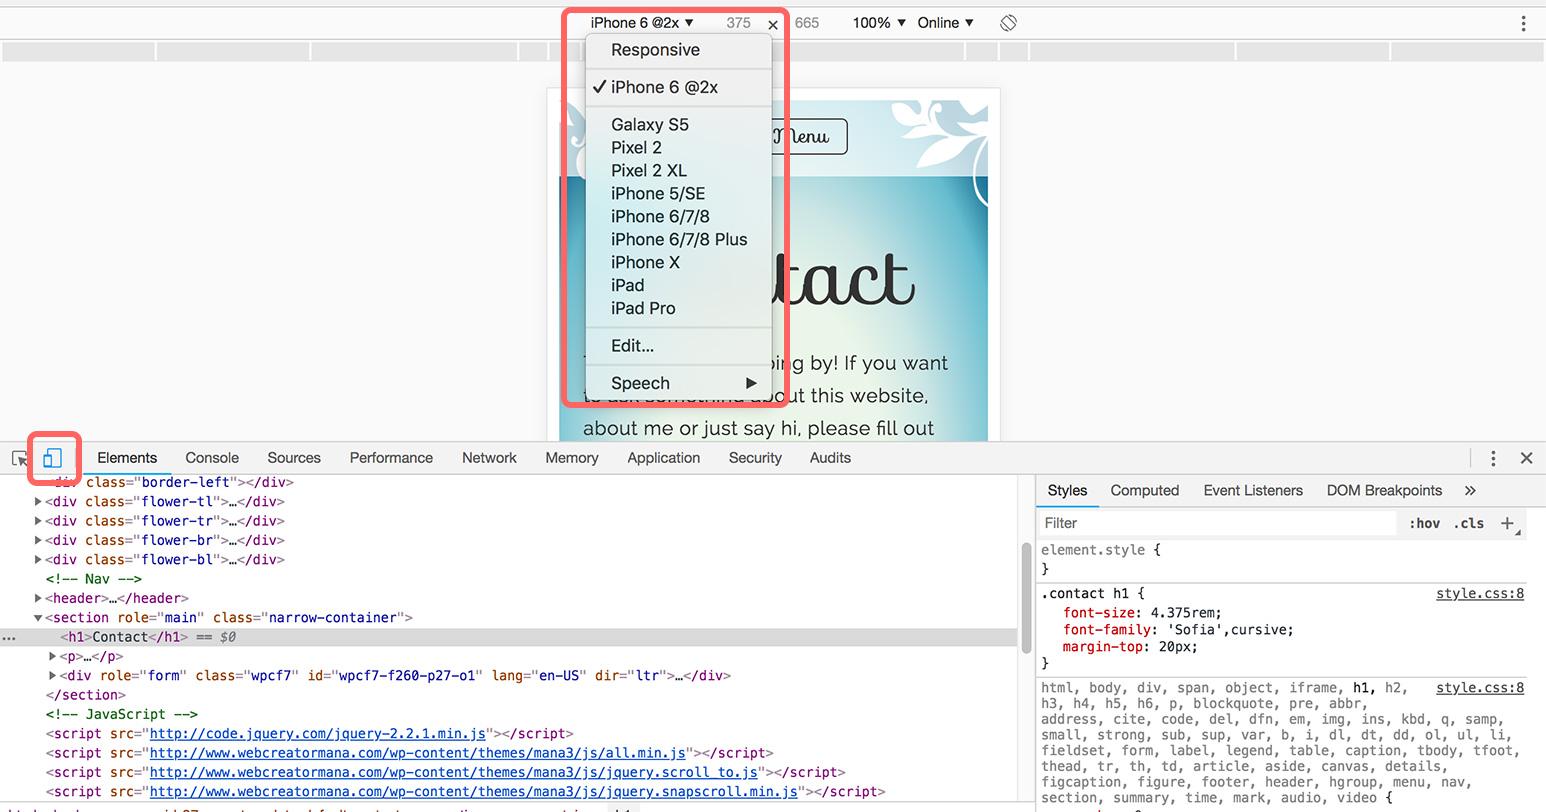 Chromeデベロッパーツールでモバイルサイズの検証